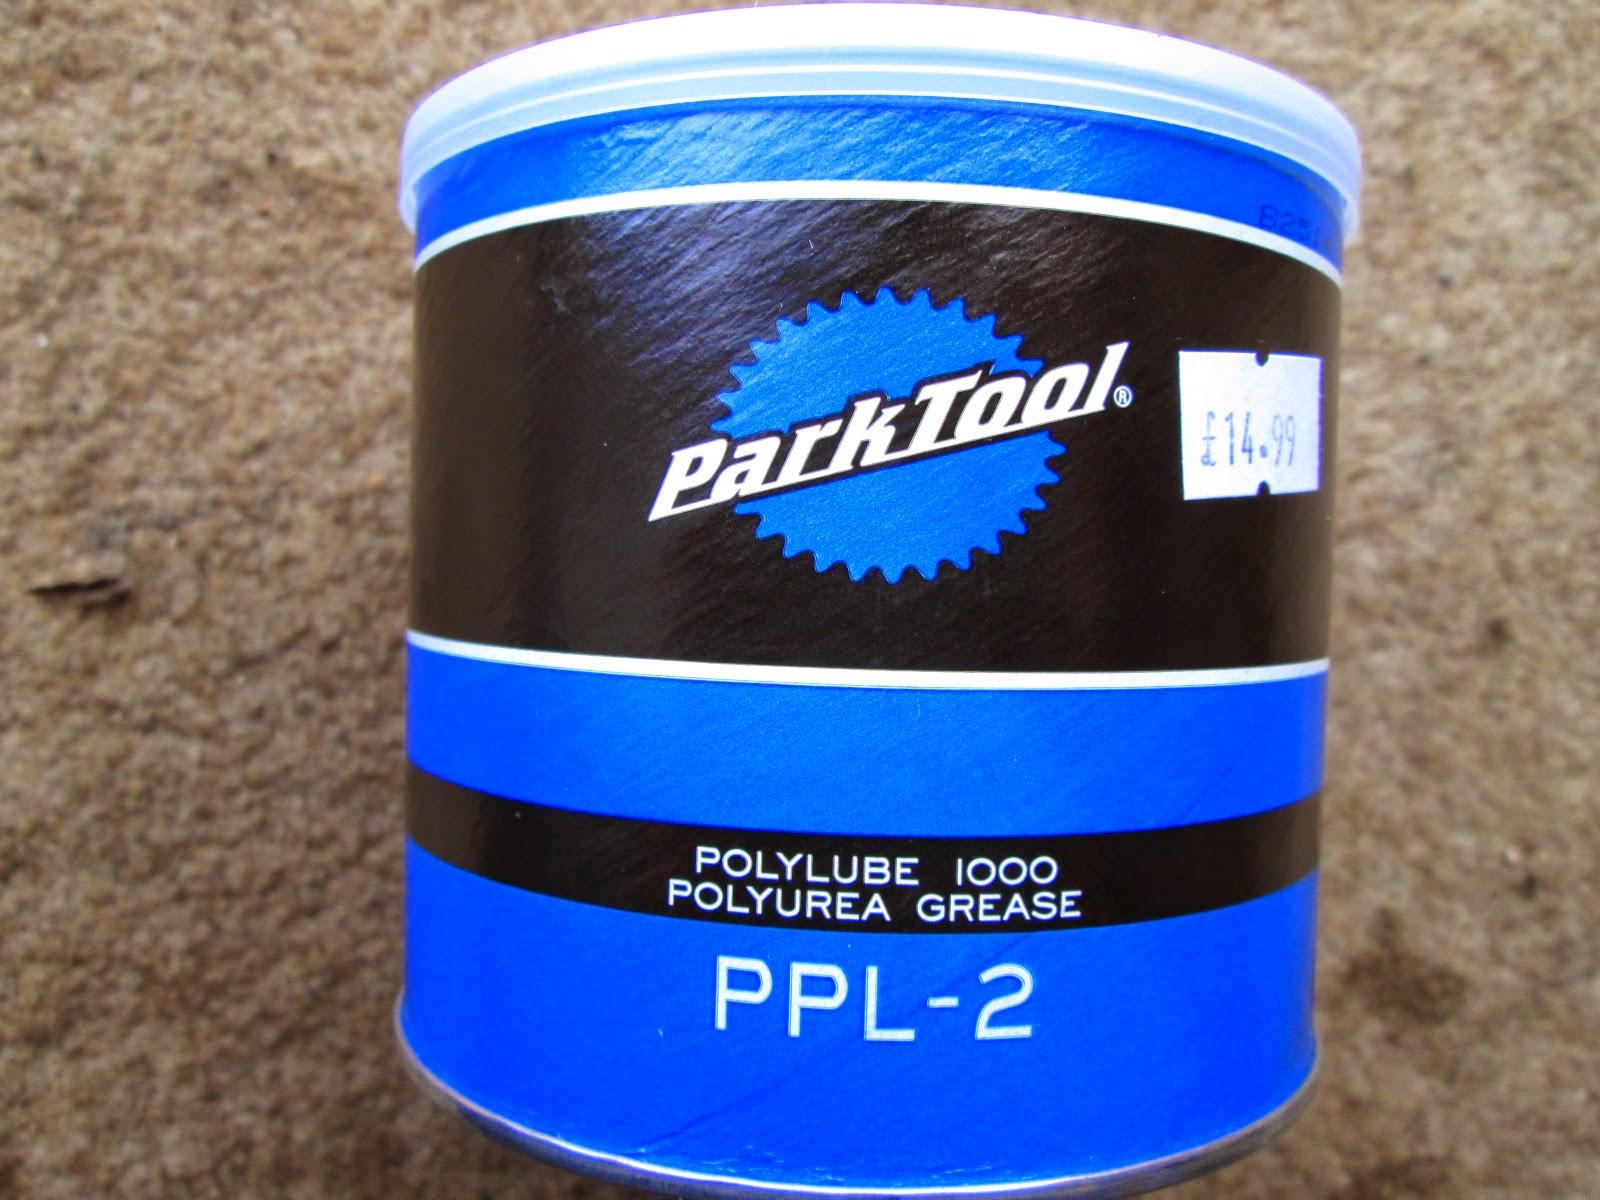 Muddy Brown's Blog: Fresh Goods Sunday - Park Tool PPL-2 Poly Lube